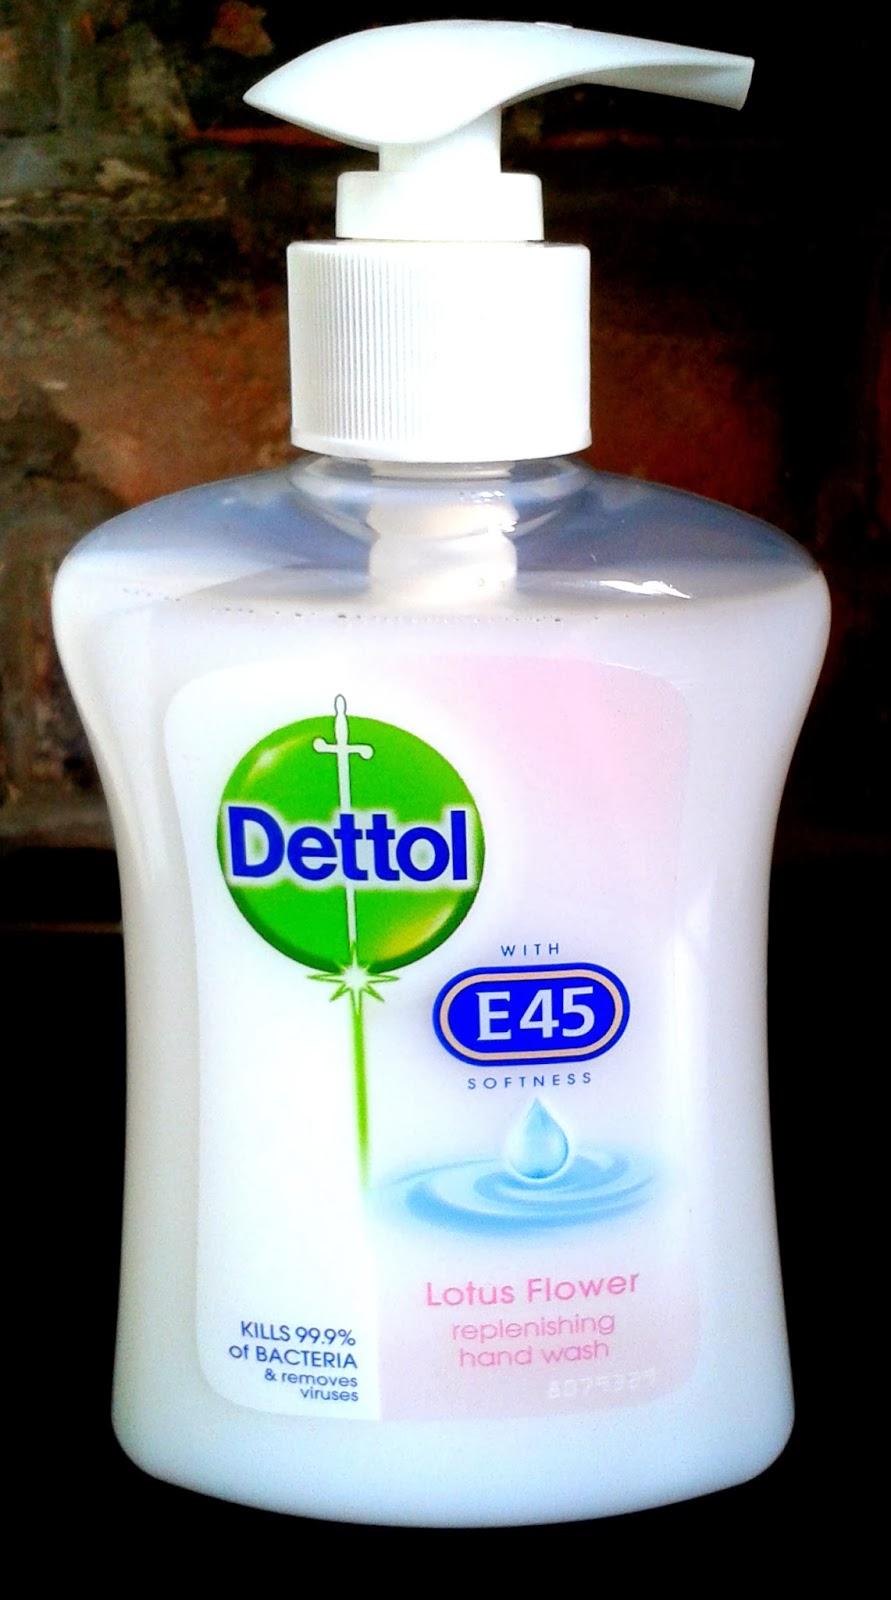 Dettol & E45 Softness Hand Wash, Hand Wash, E45 Handwash, Antibacterial Hand Wash